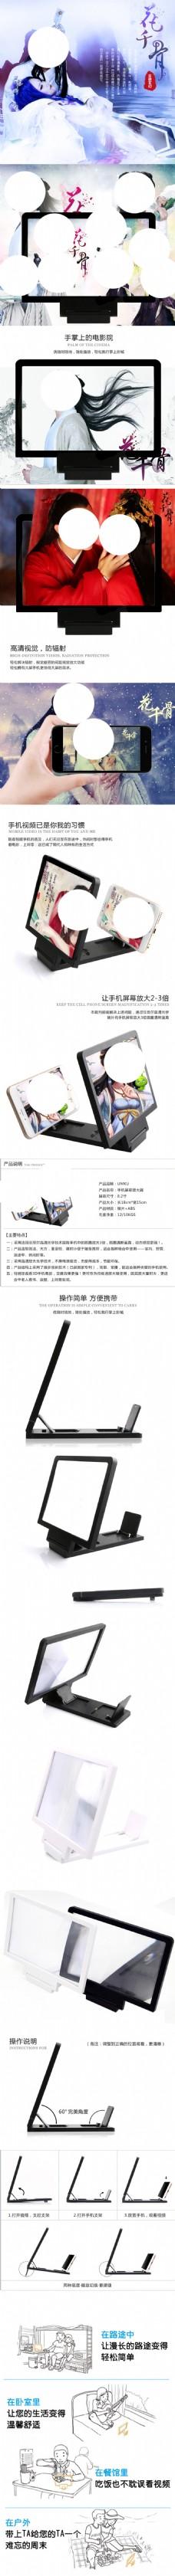 3D手机视频放大器详情页